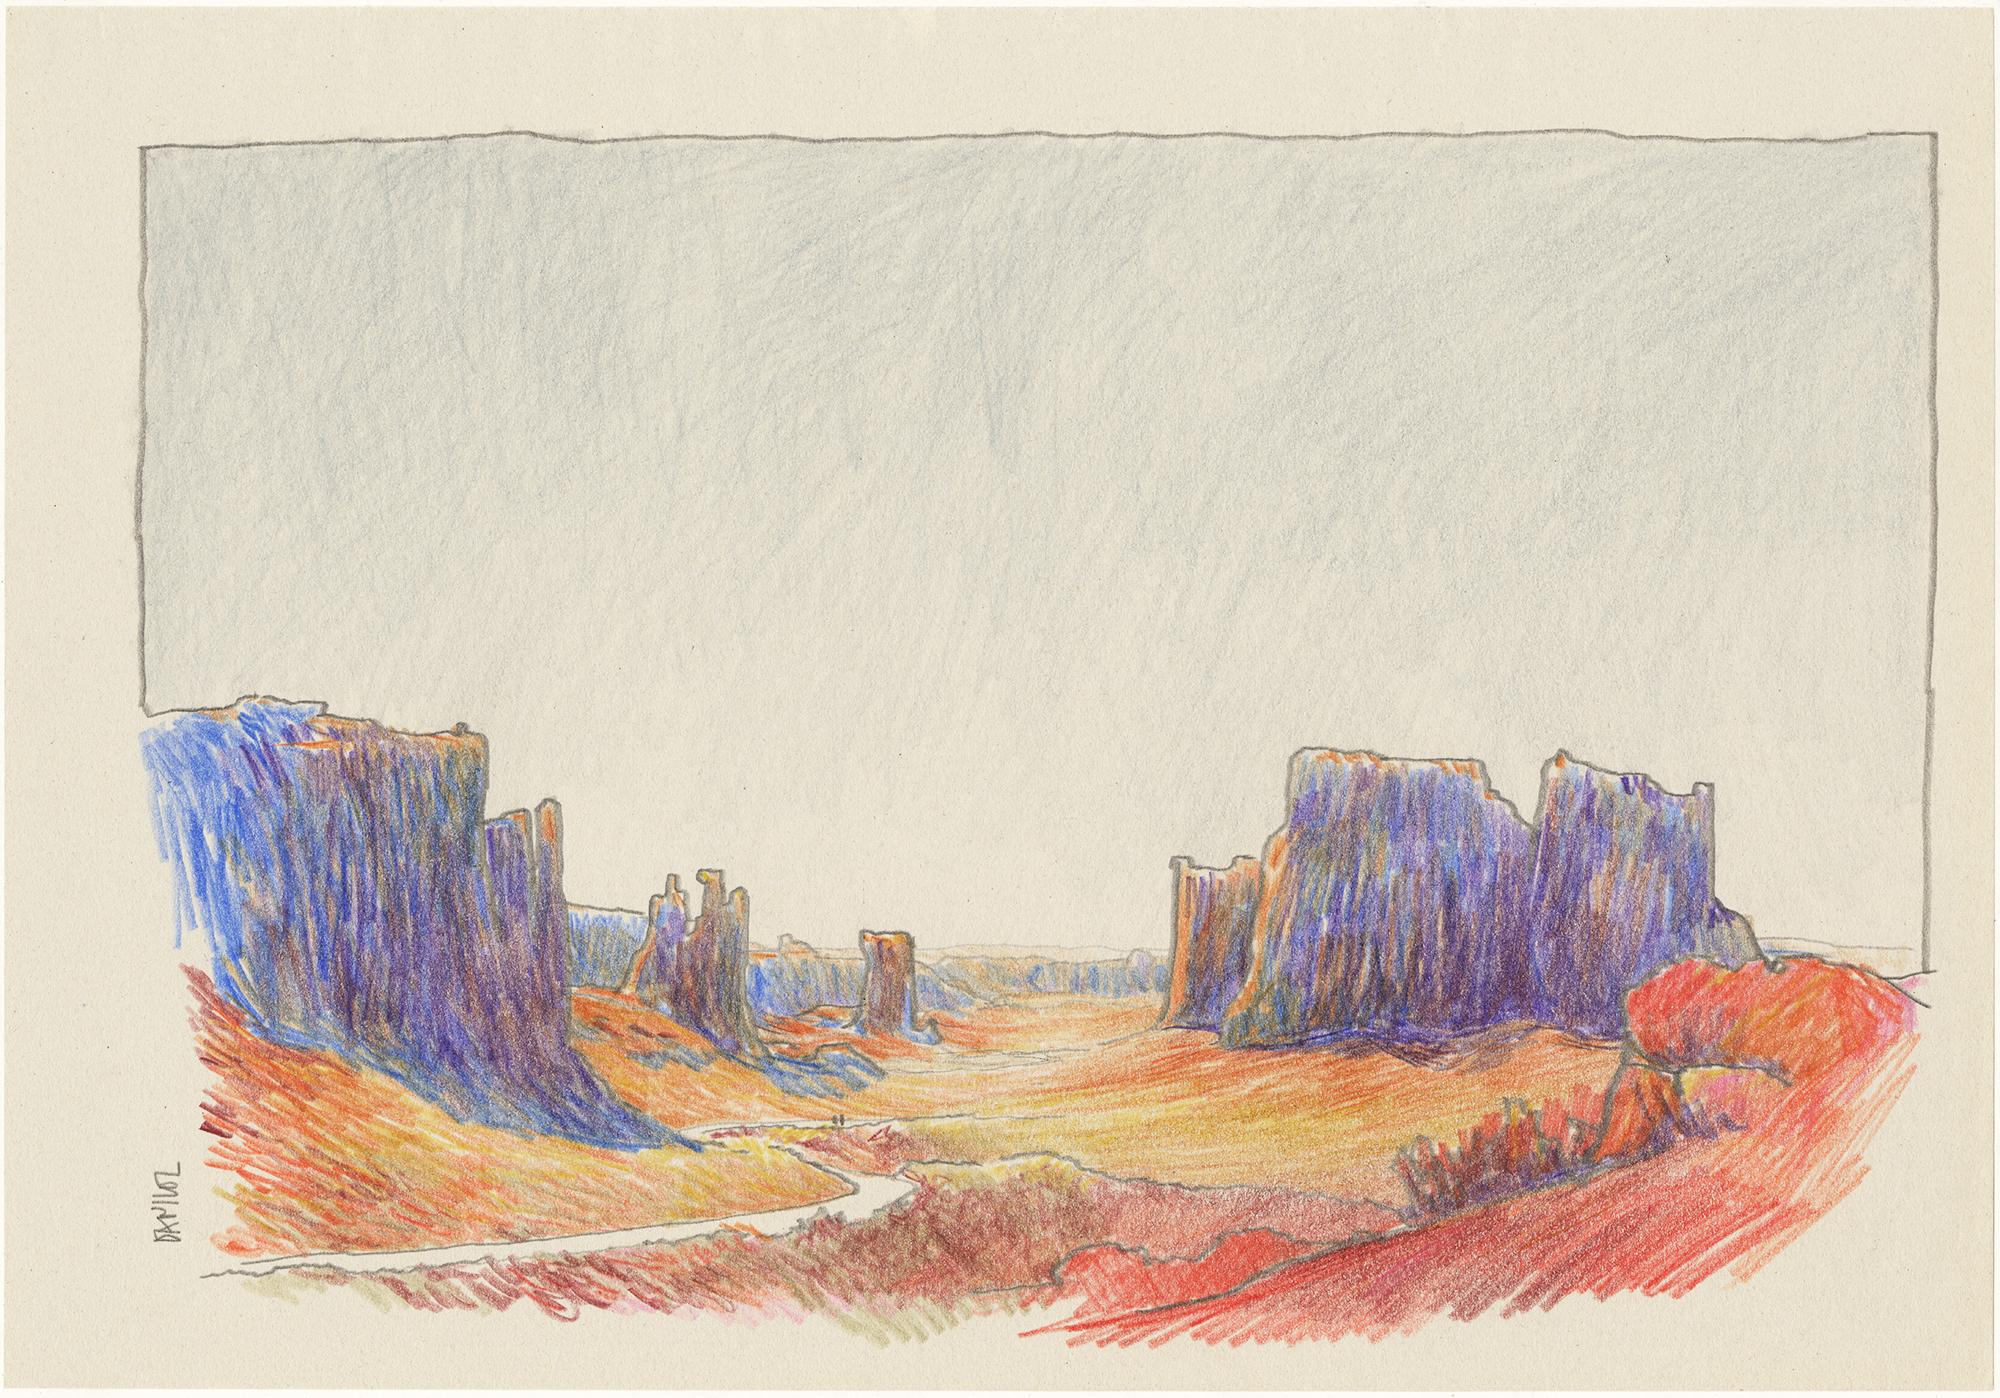 Deserto-daniloz